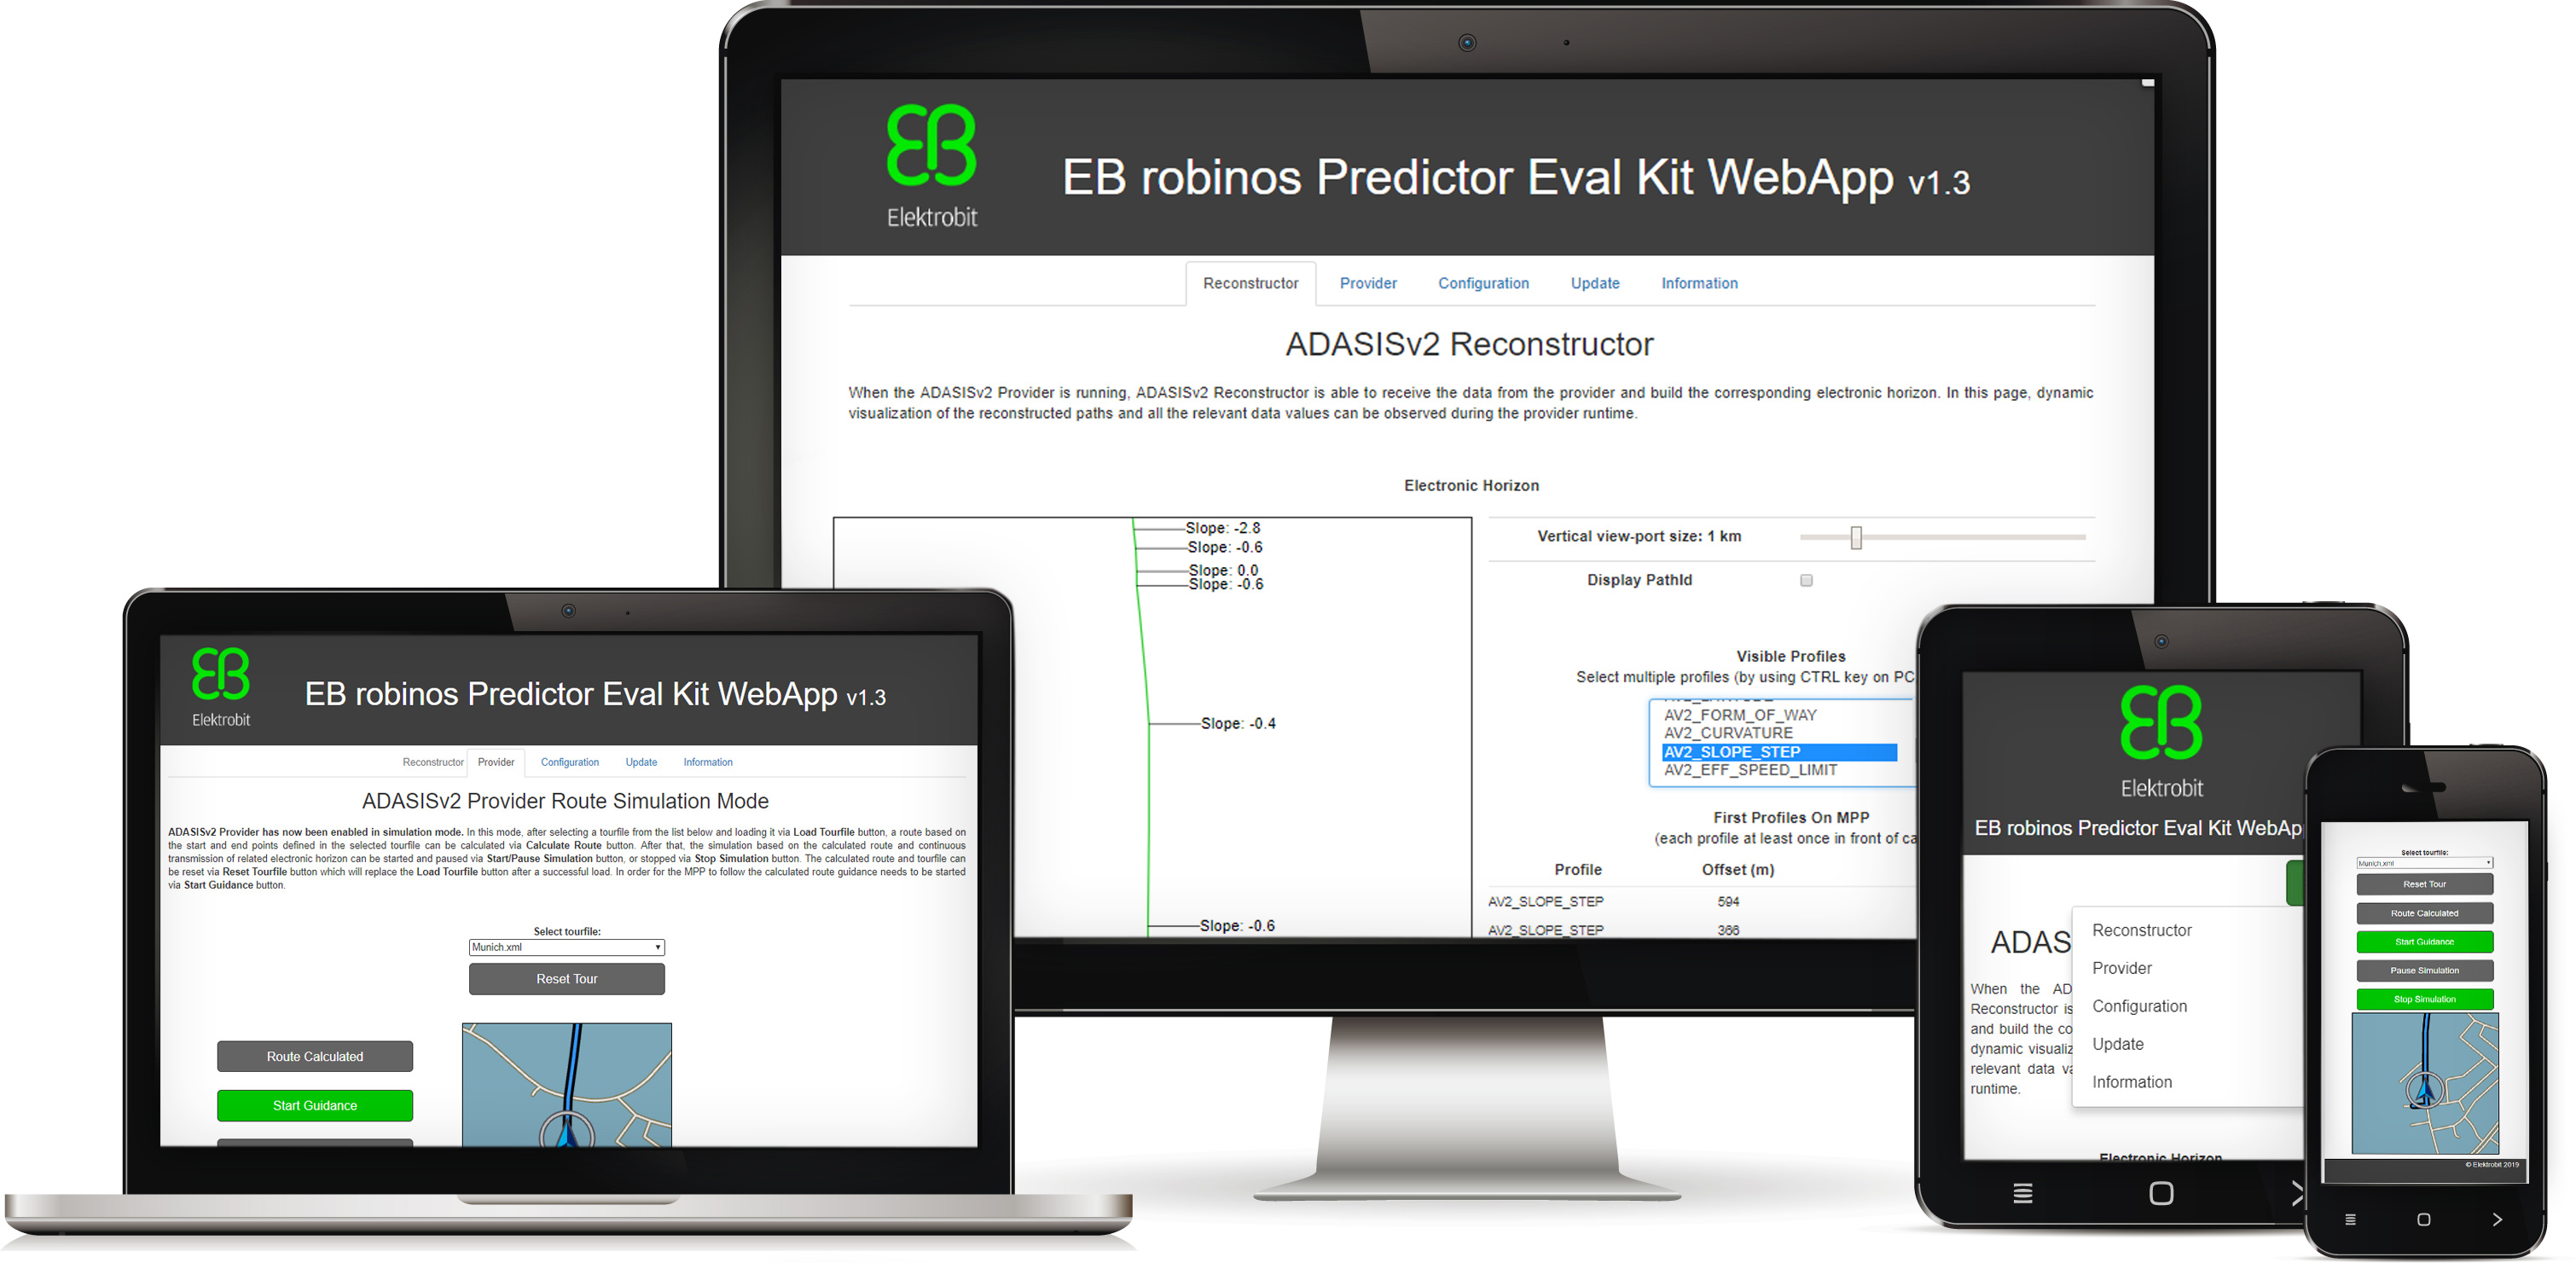 EB robinos Predictor Eval Kit - Elektrobit